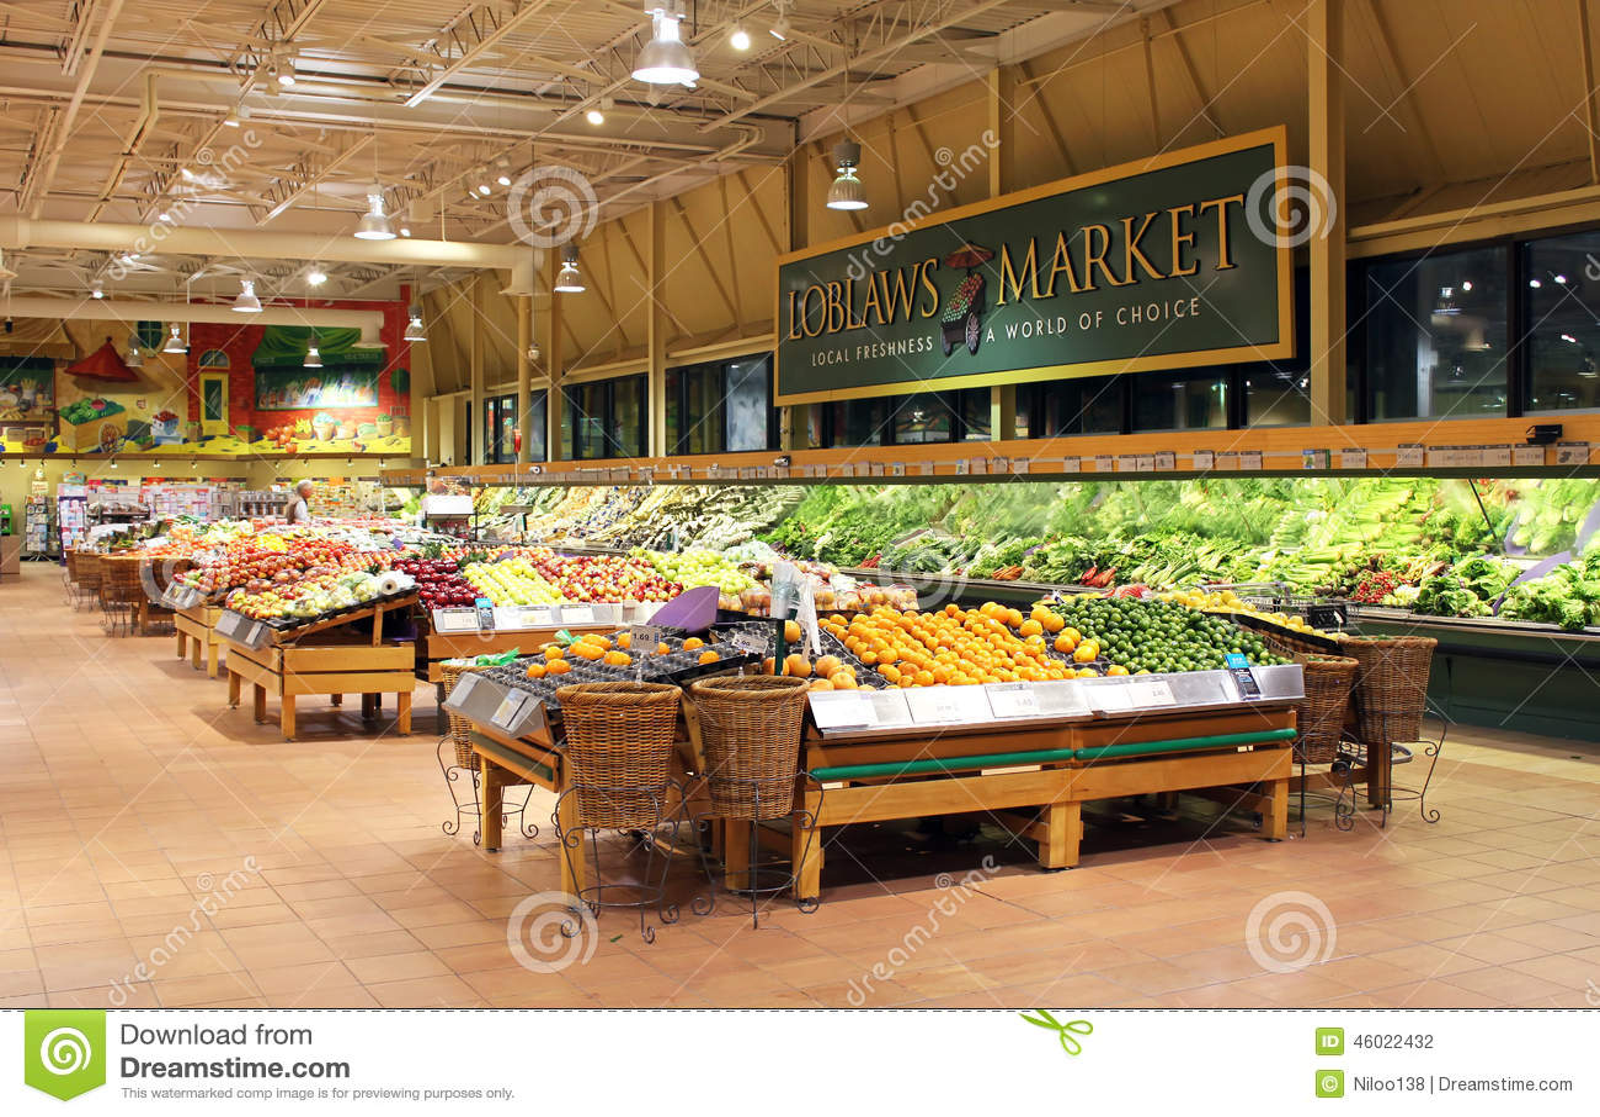 Loblaws Supermarket Editorial Photography